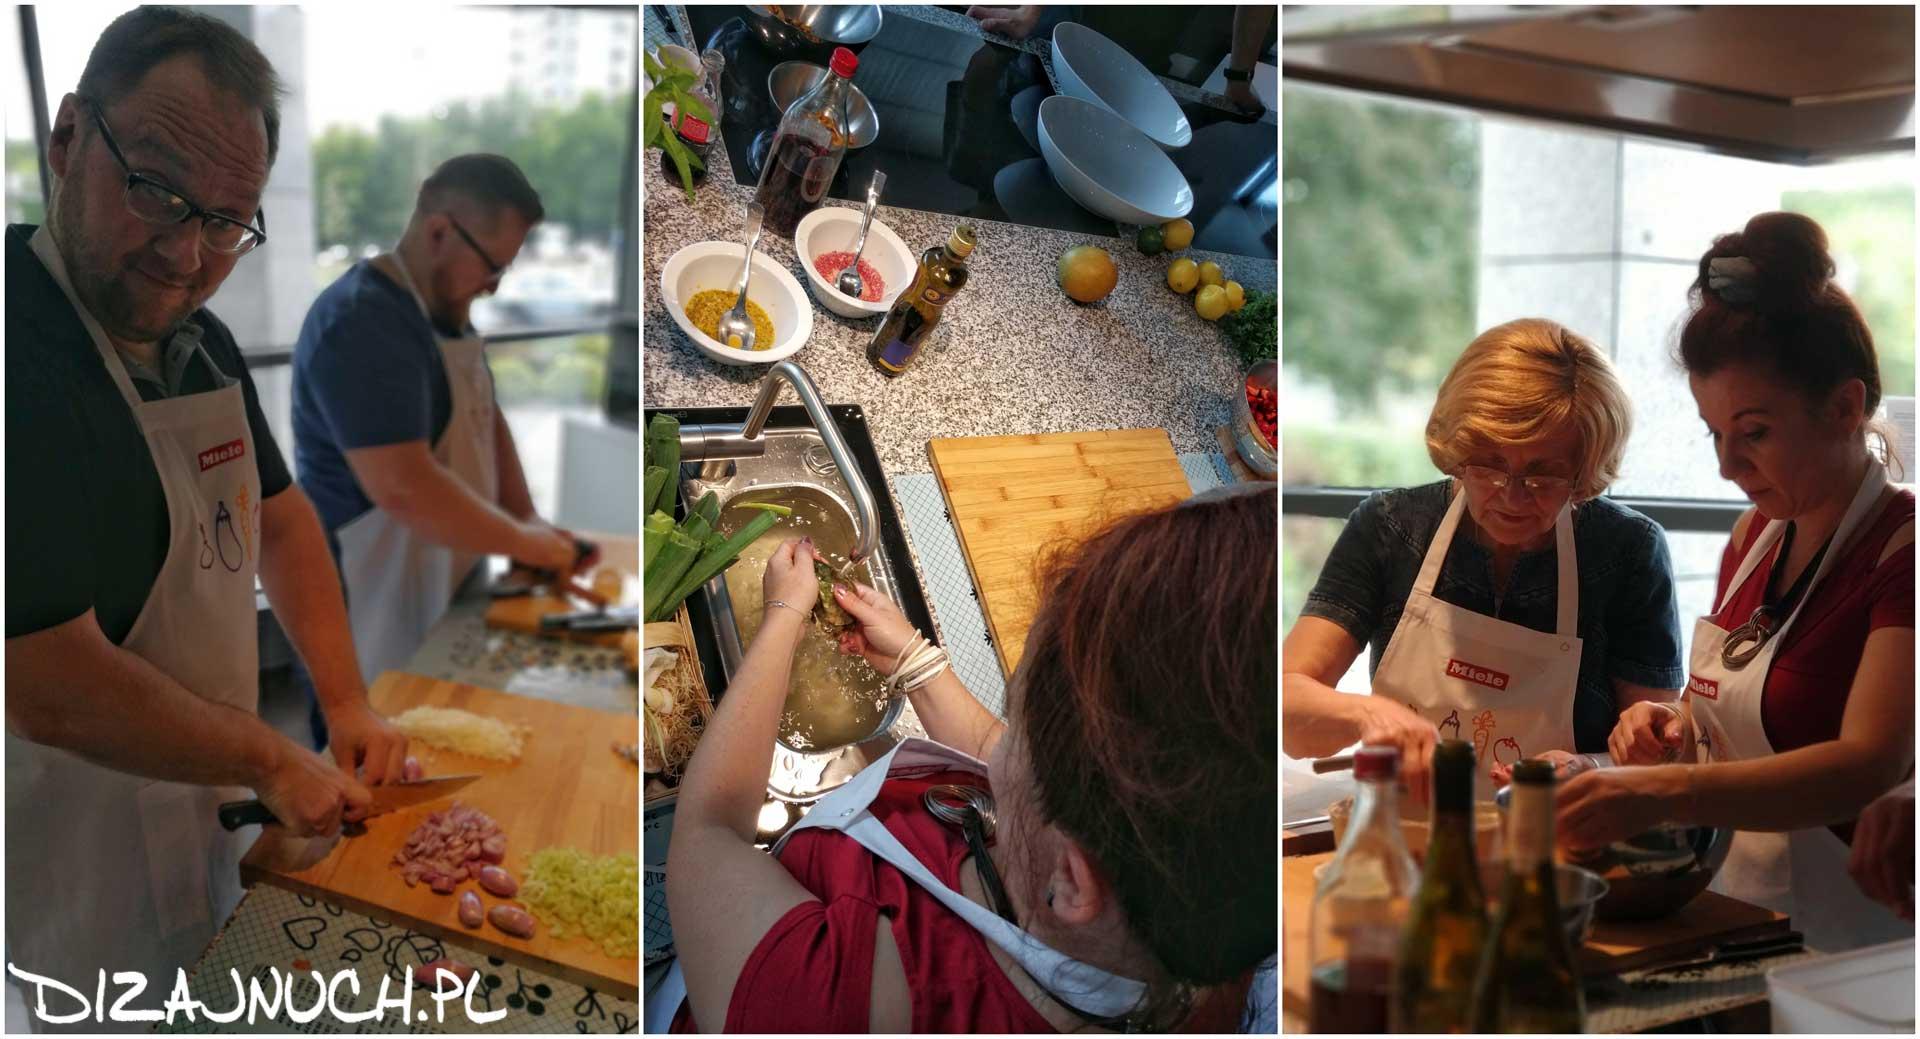 warsztaty kulinarne